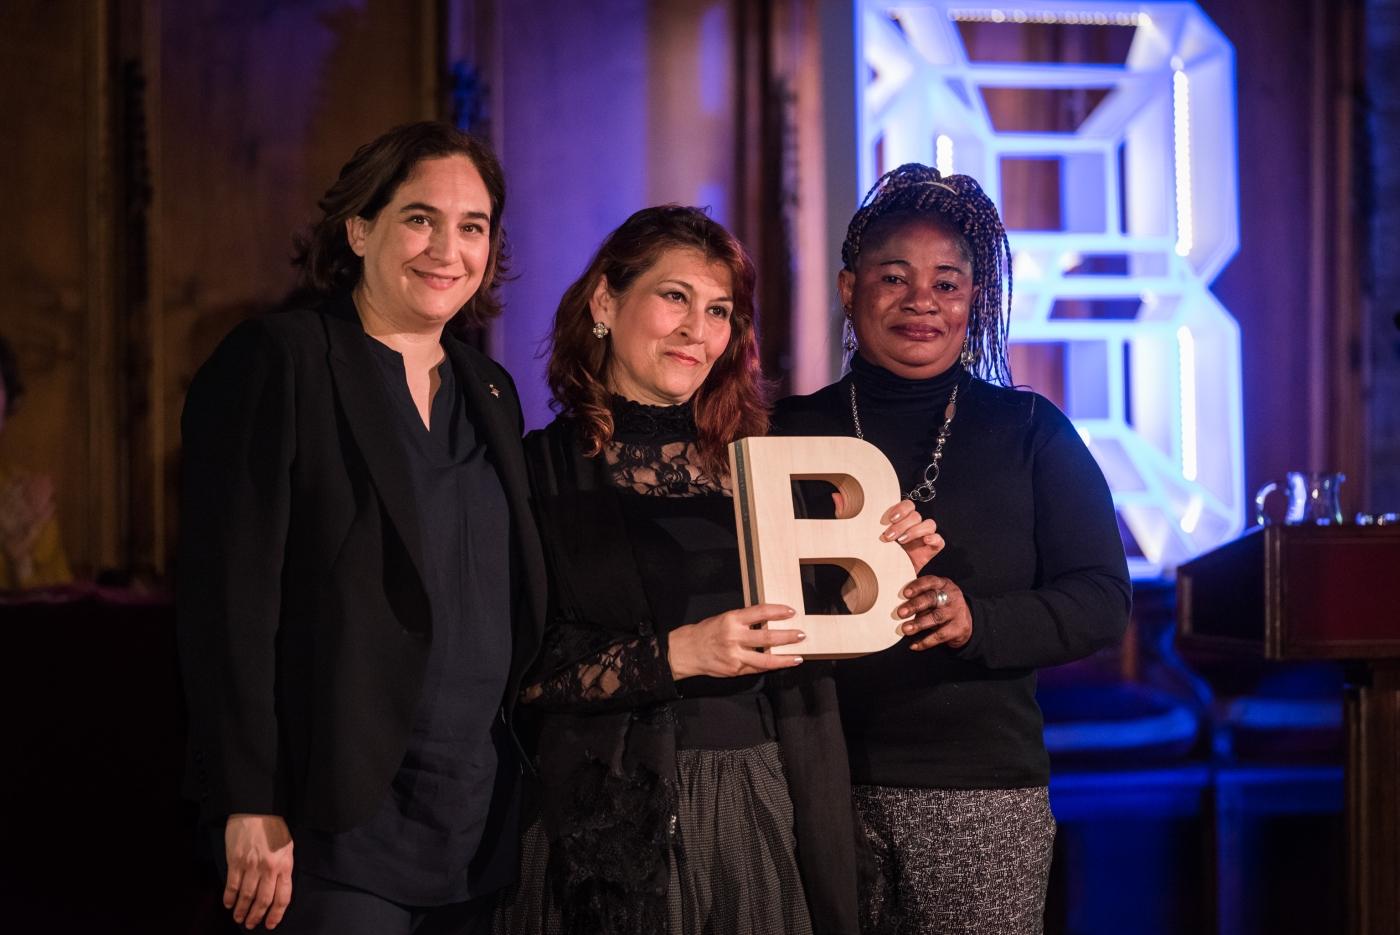 Sindihogar / Sindillar - Premi Ciutat de Barcelona d'Educació 2017